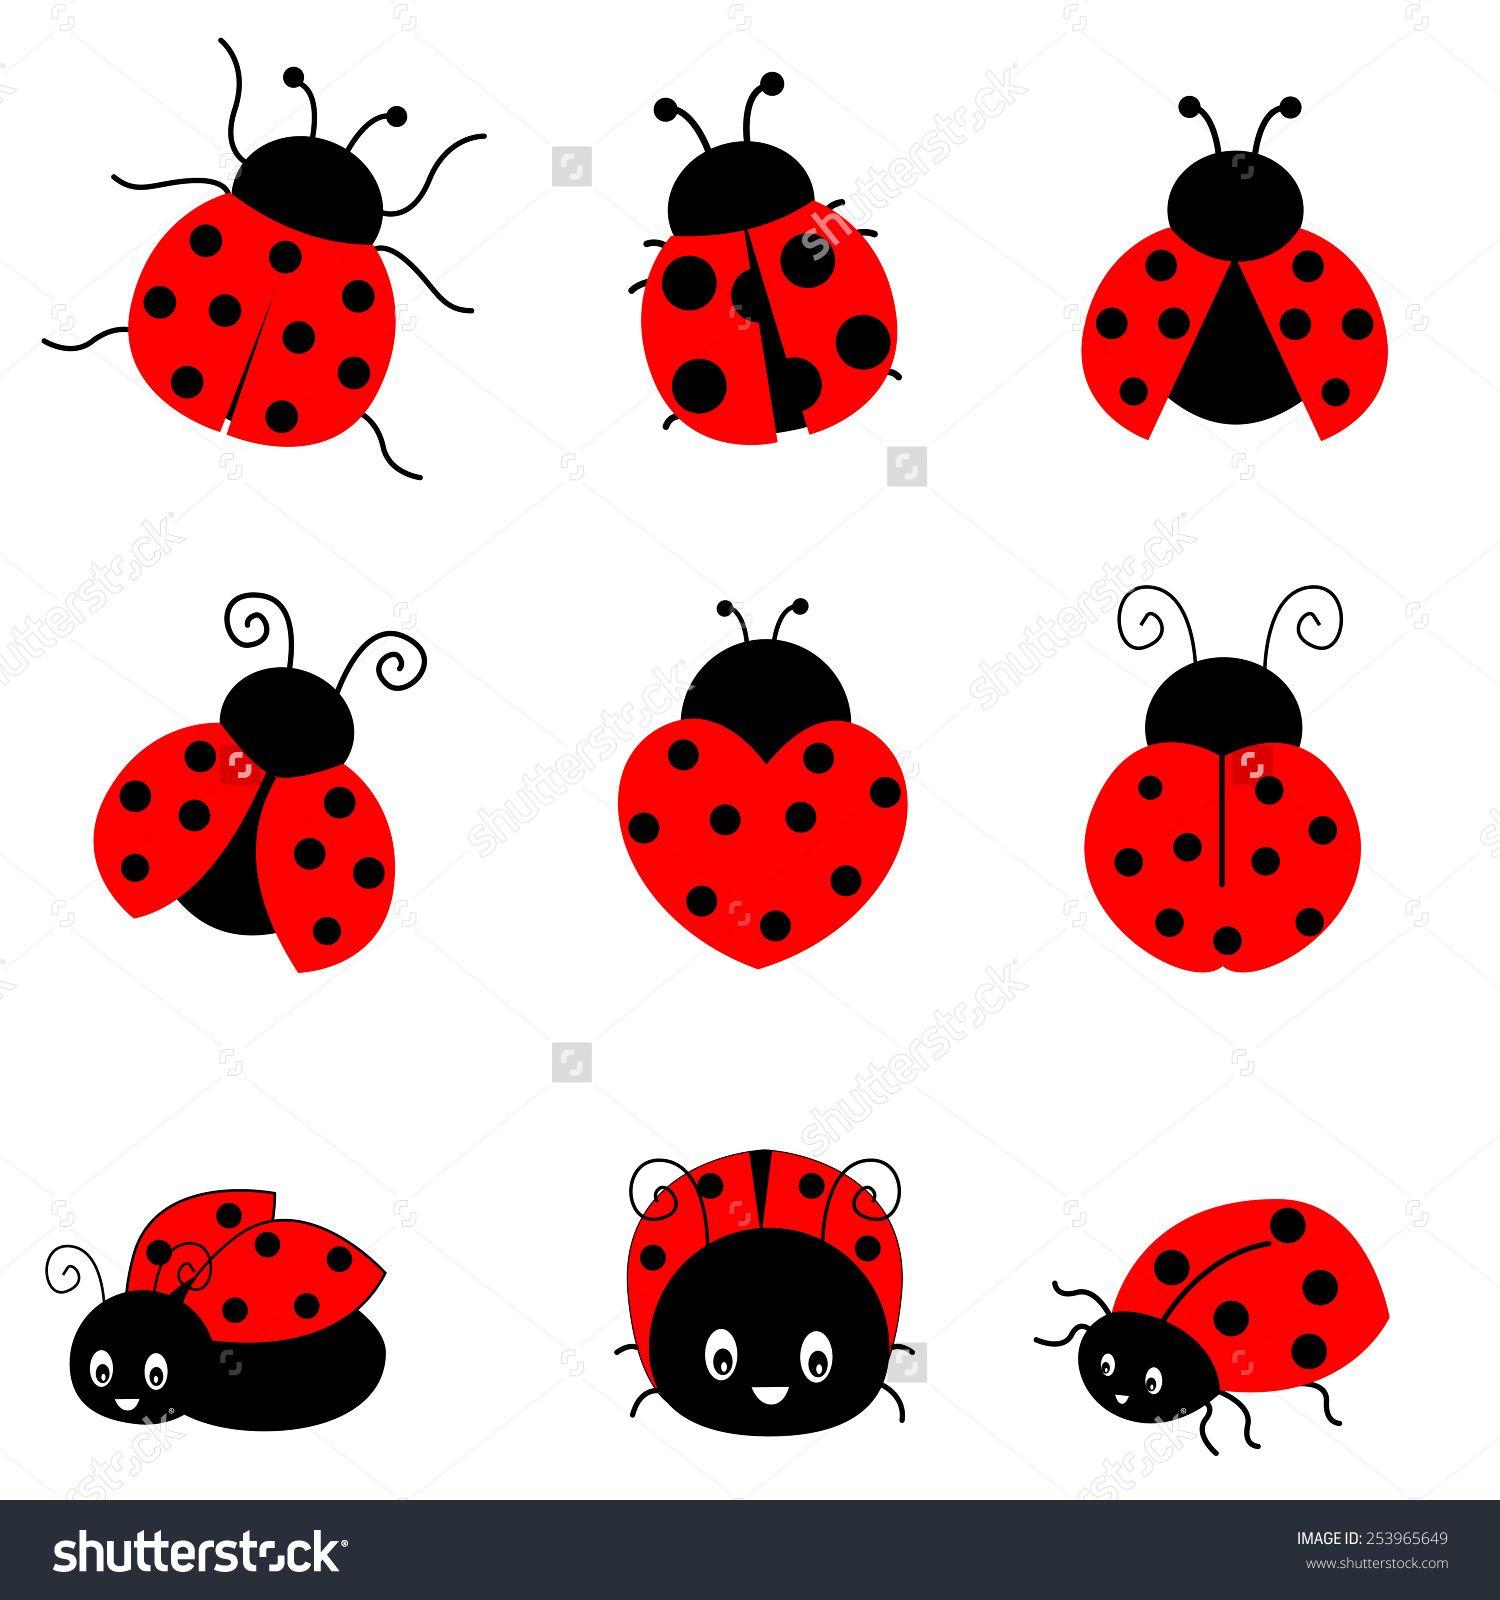 ... clip art stock photos forward cute colorful ladybugs clip art